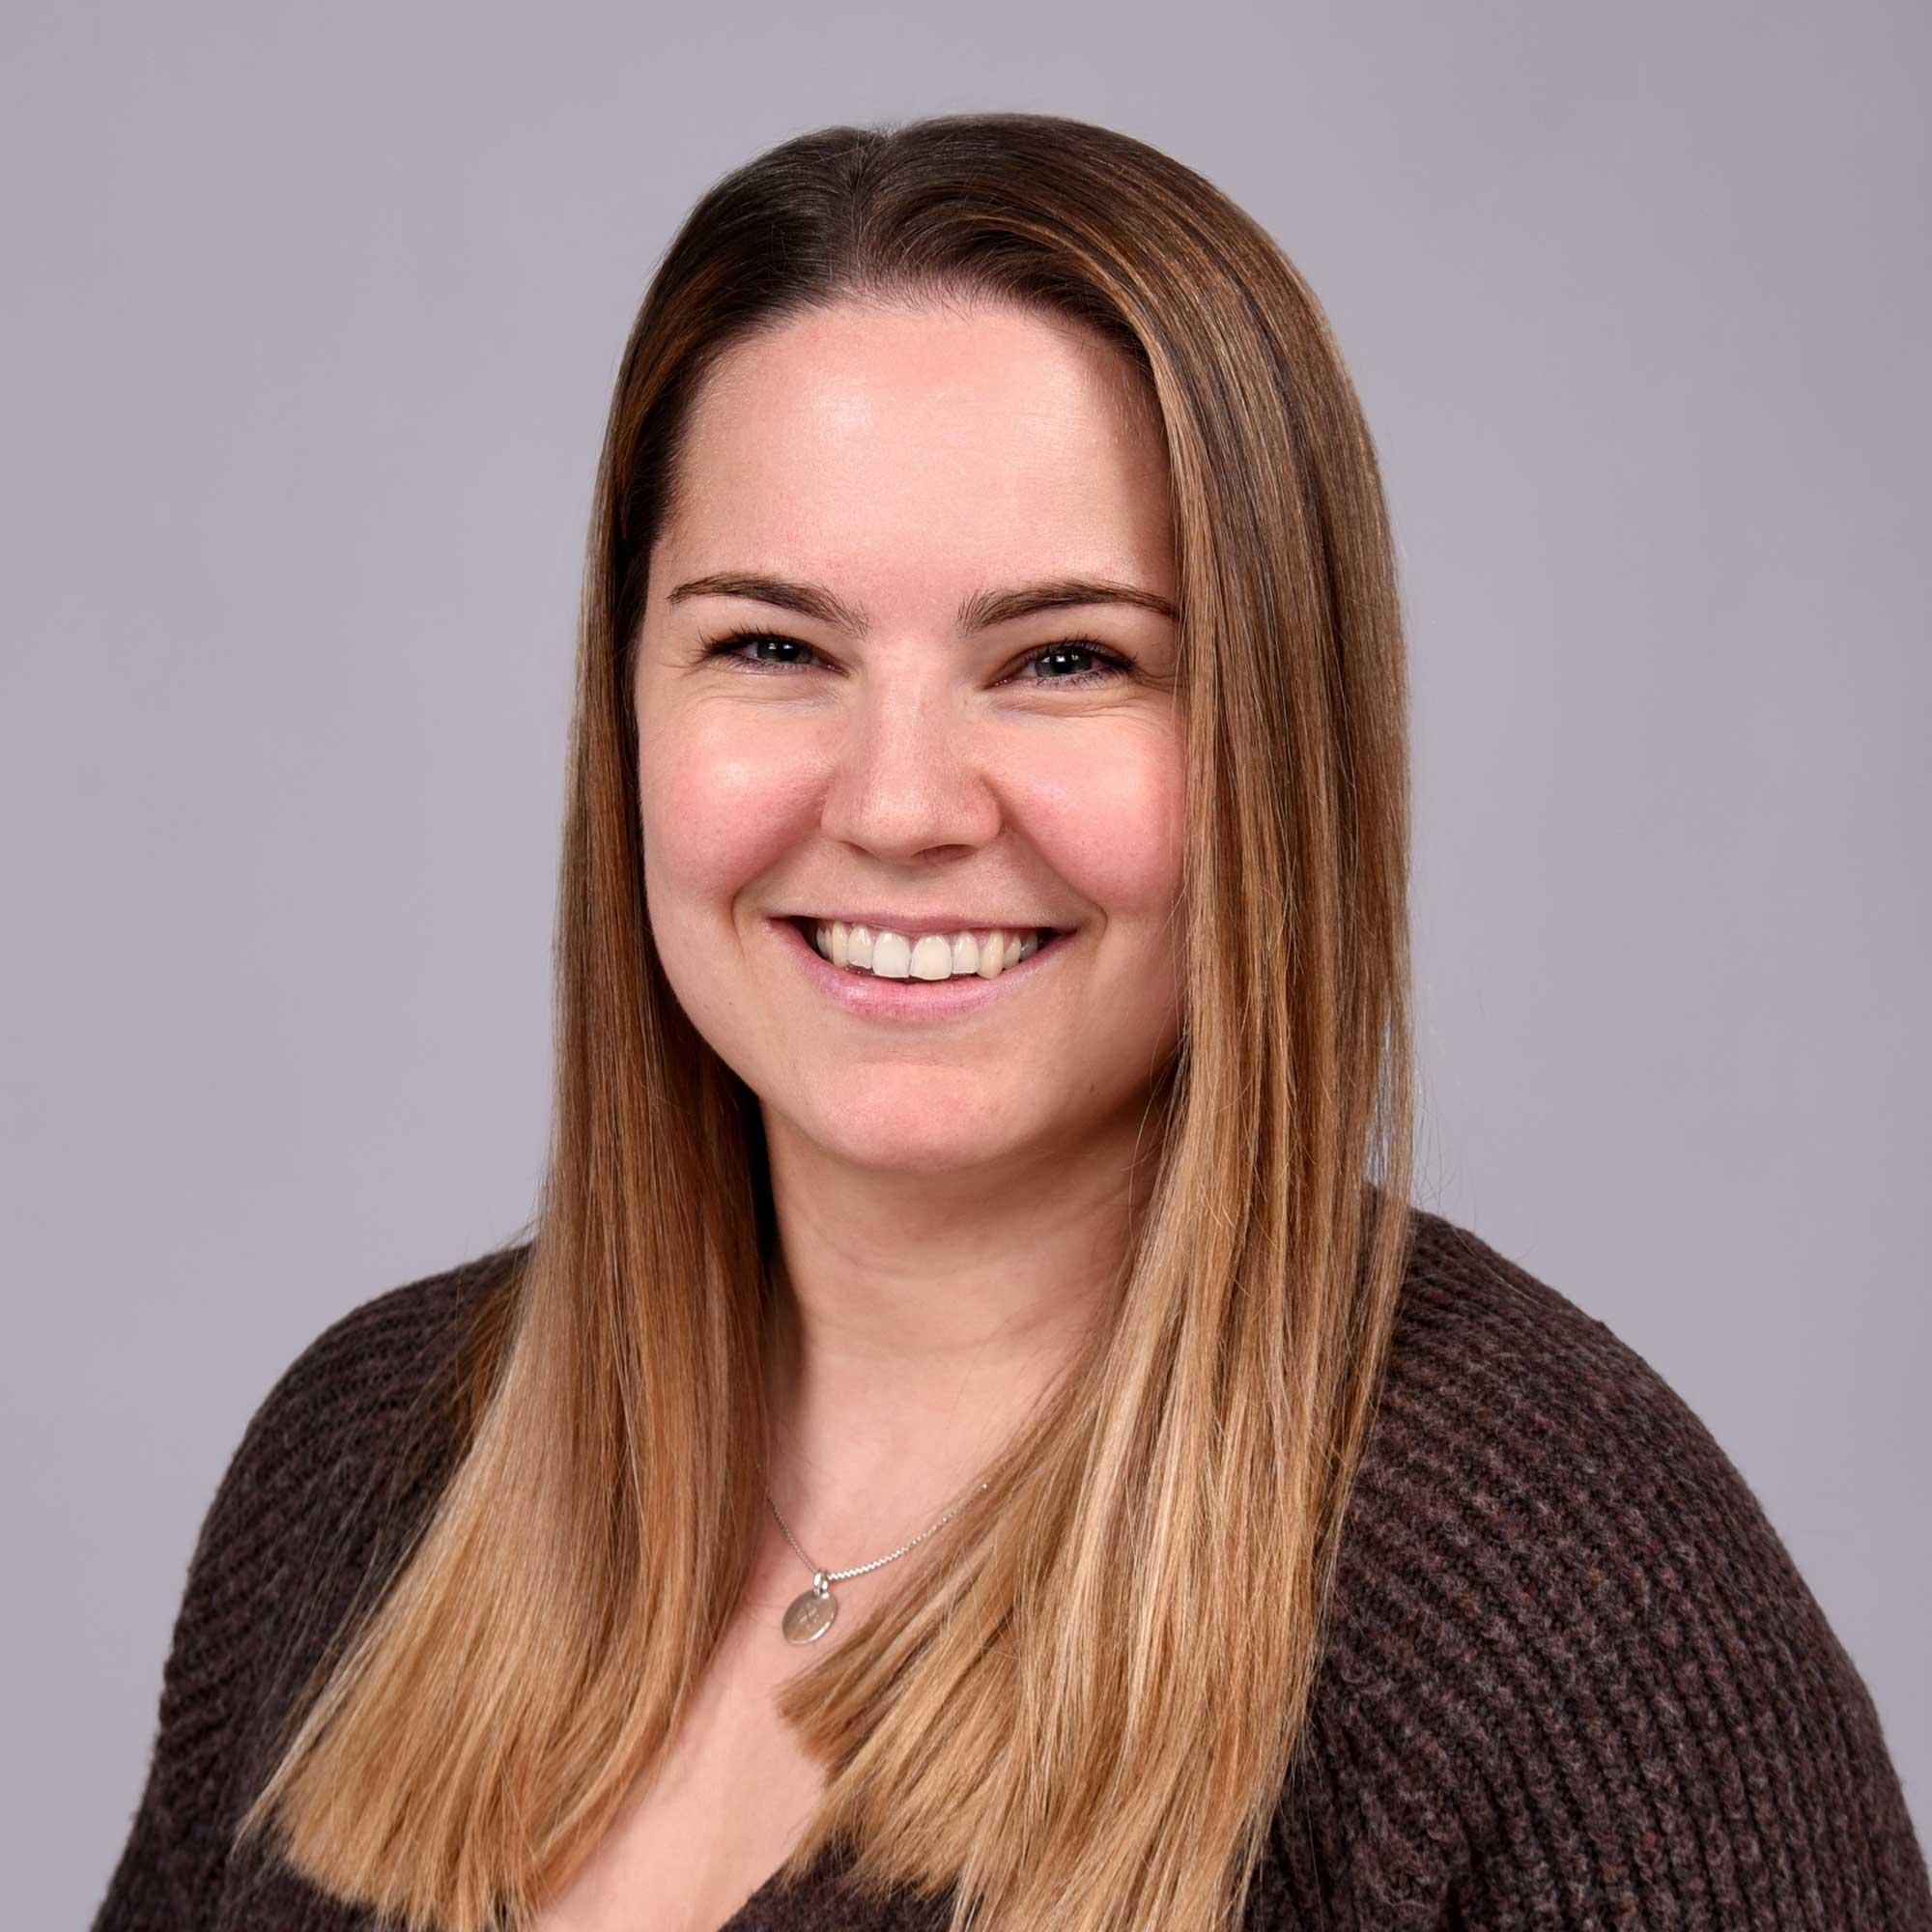 Jasmin Grossenbacher